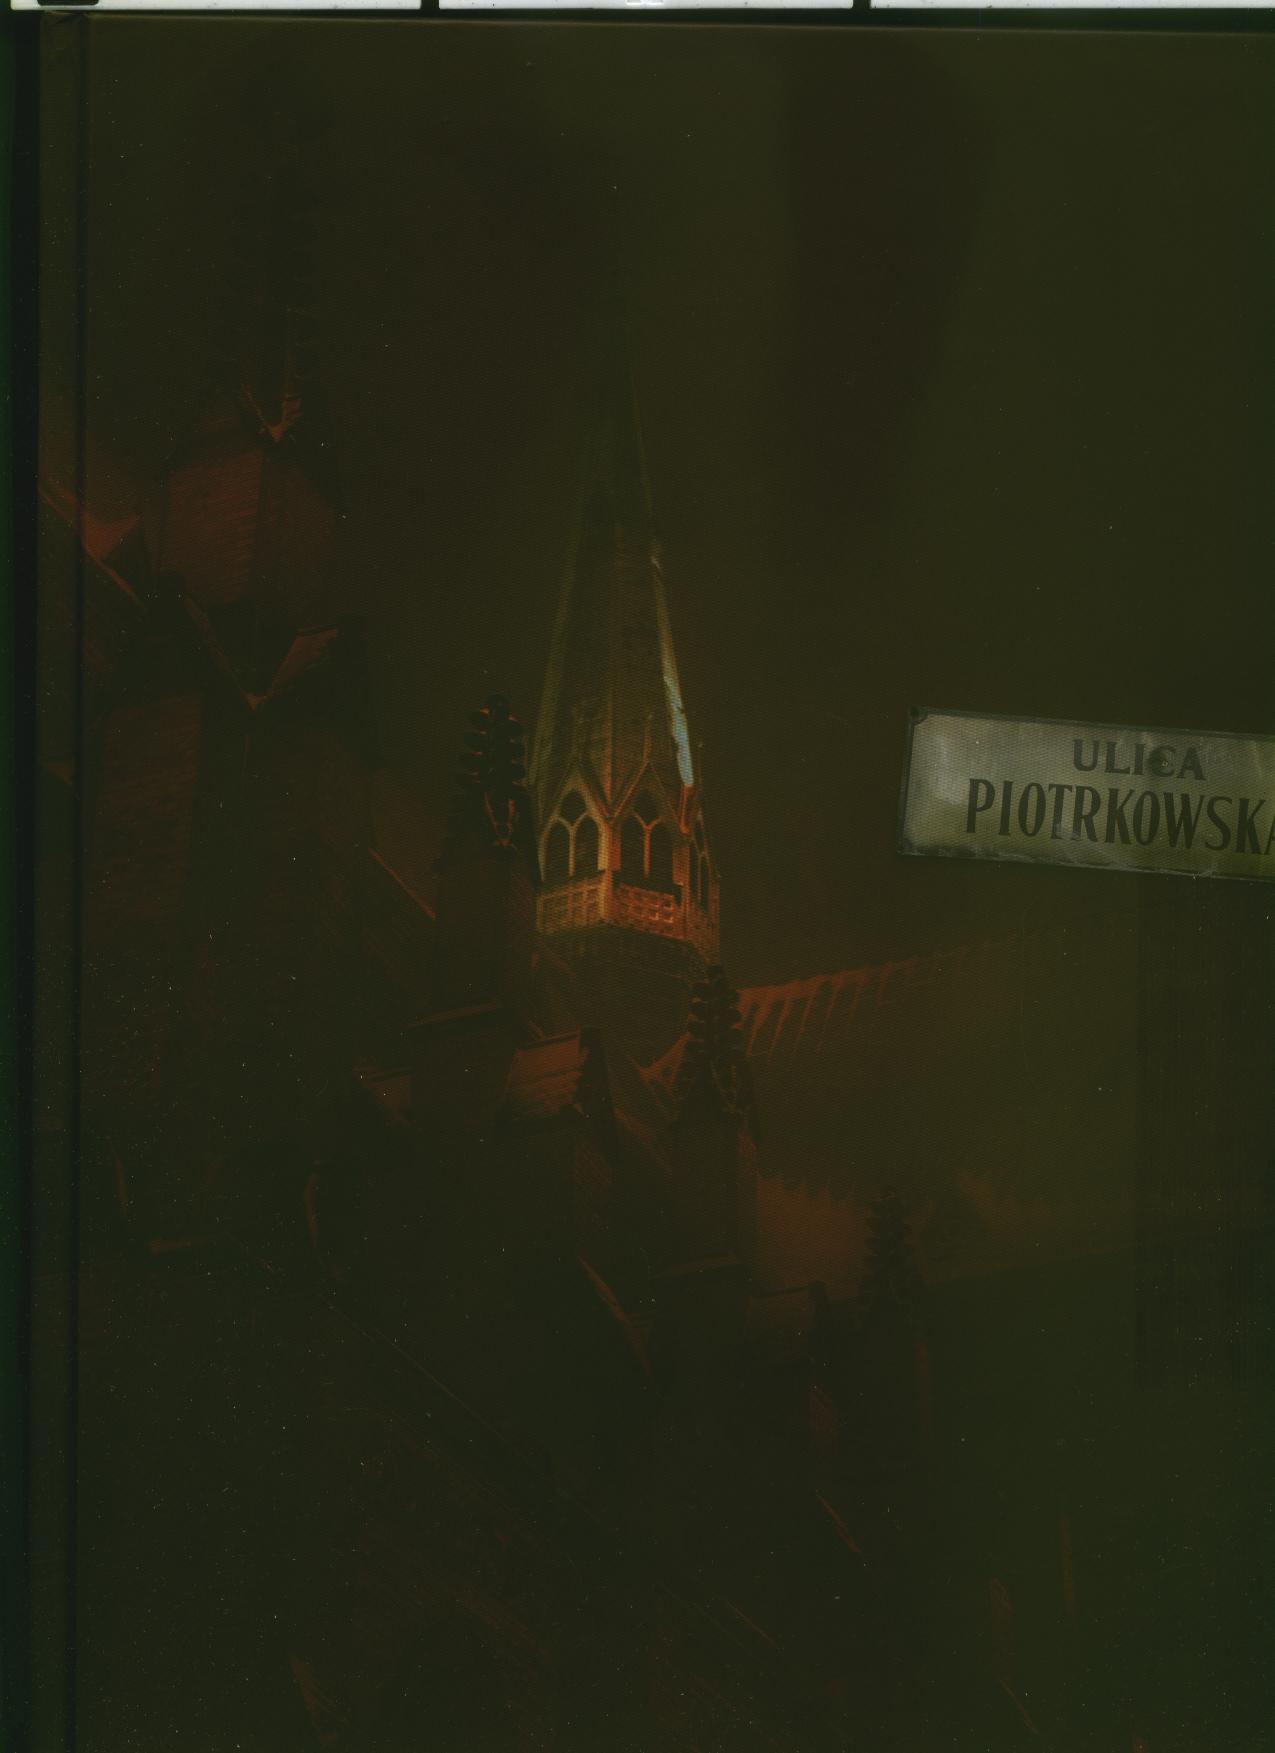 Ulica Piotrkowska- Spacer drugi